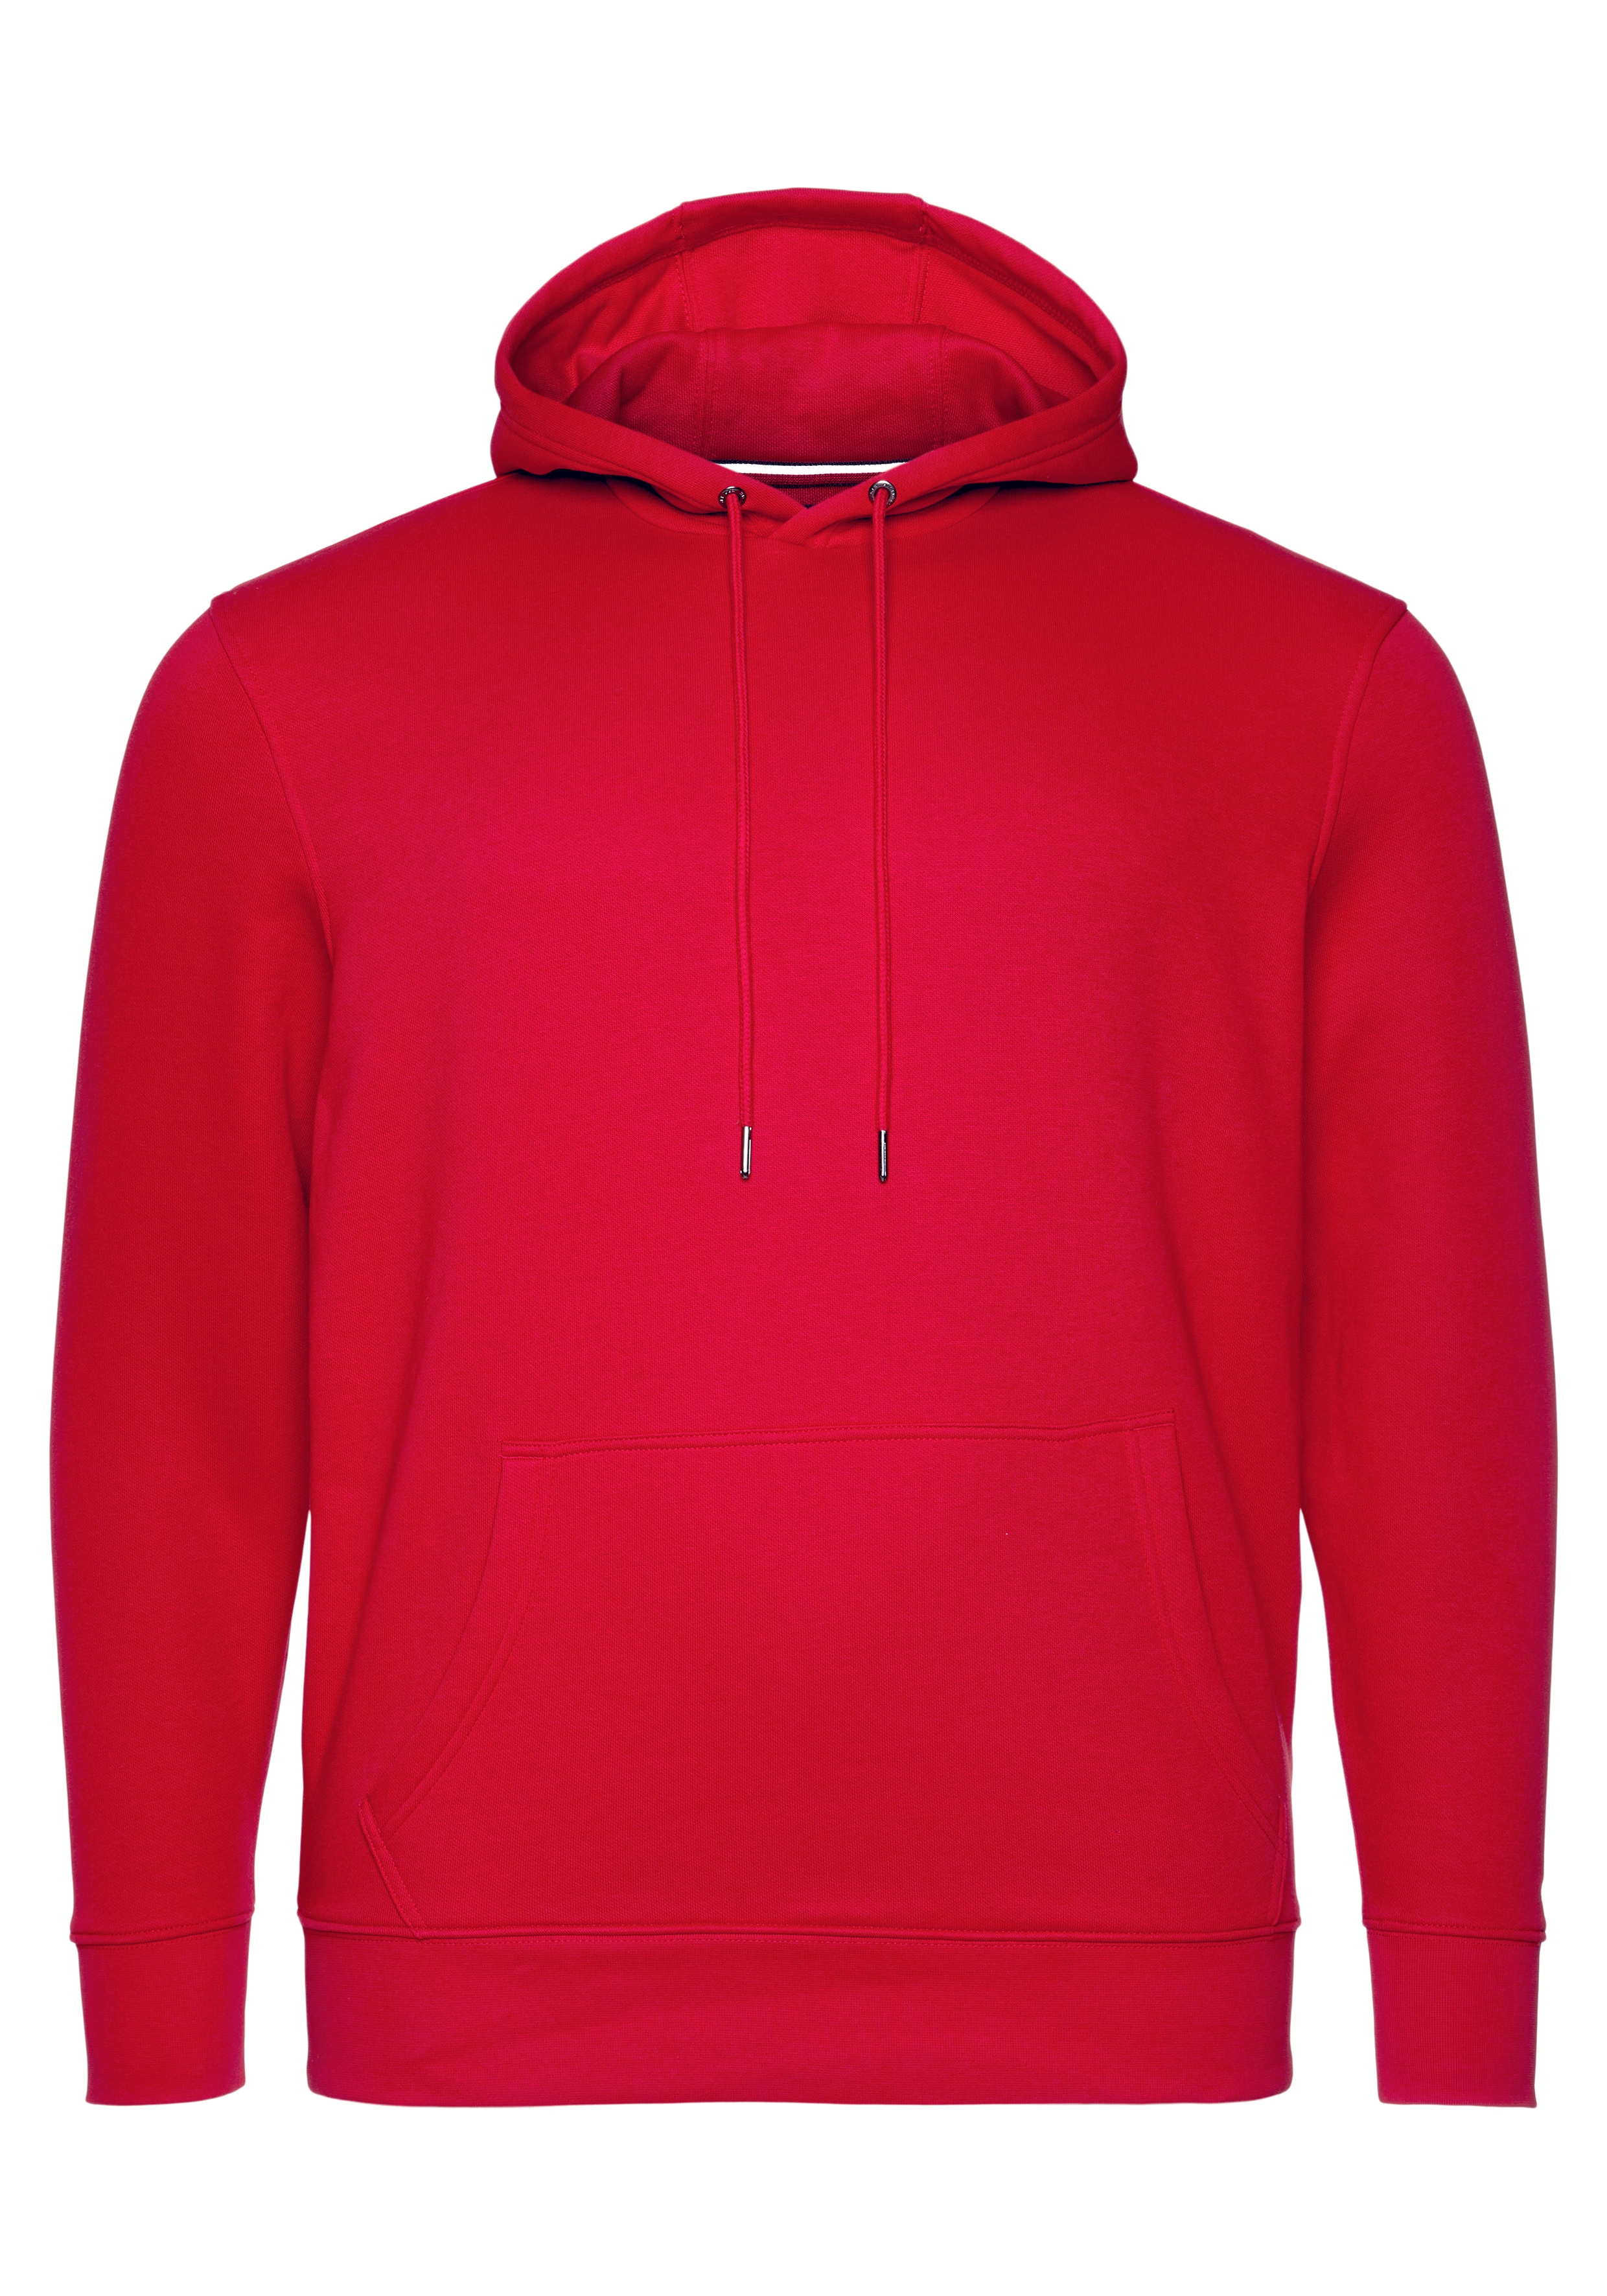 tommy hilfiger big & tall -  Kapuzensweatshirt BT-HILFIGER LOGO HOODIE